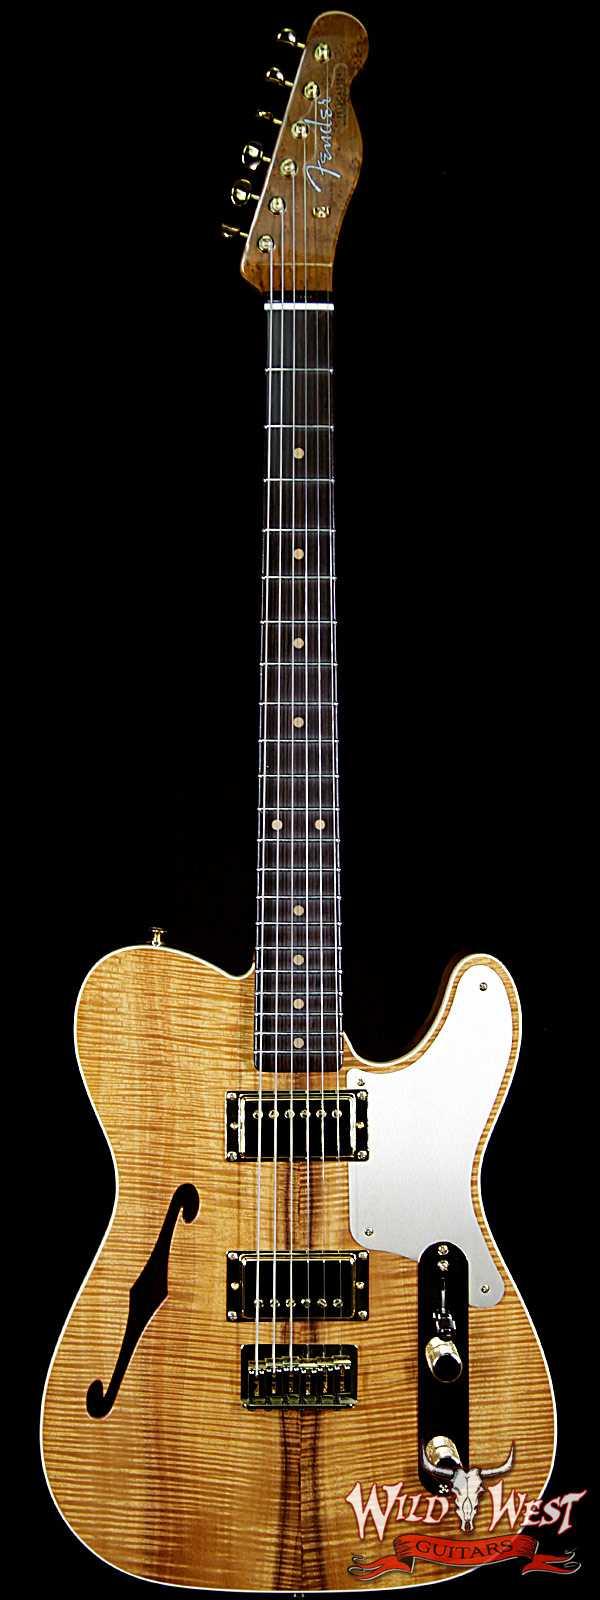 Fender Custom Shop Dennis Galuszka Masterbuilt Artisan Thinline Telecaster HH AAAA Flame Koa Top